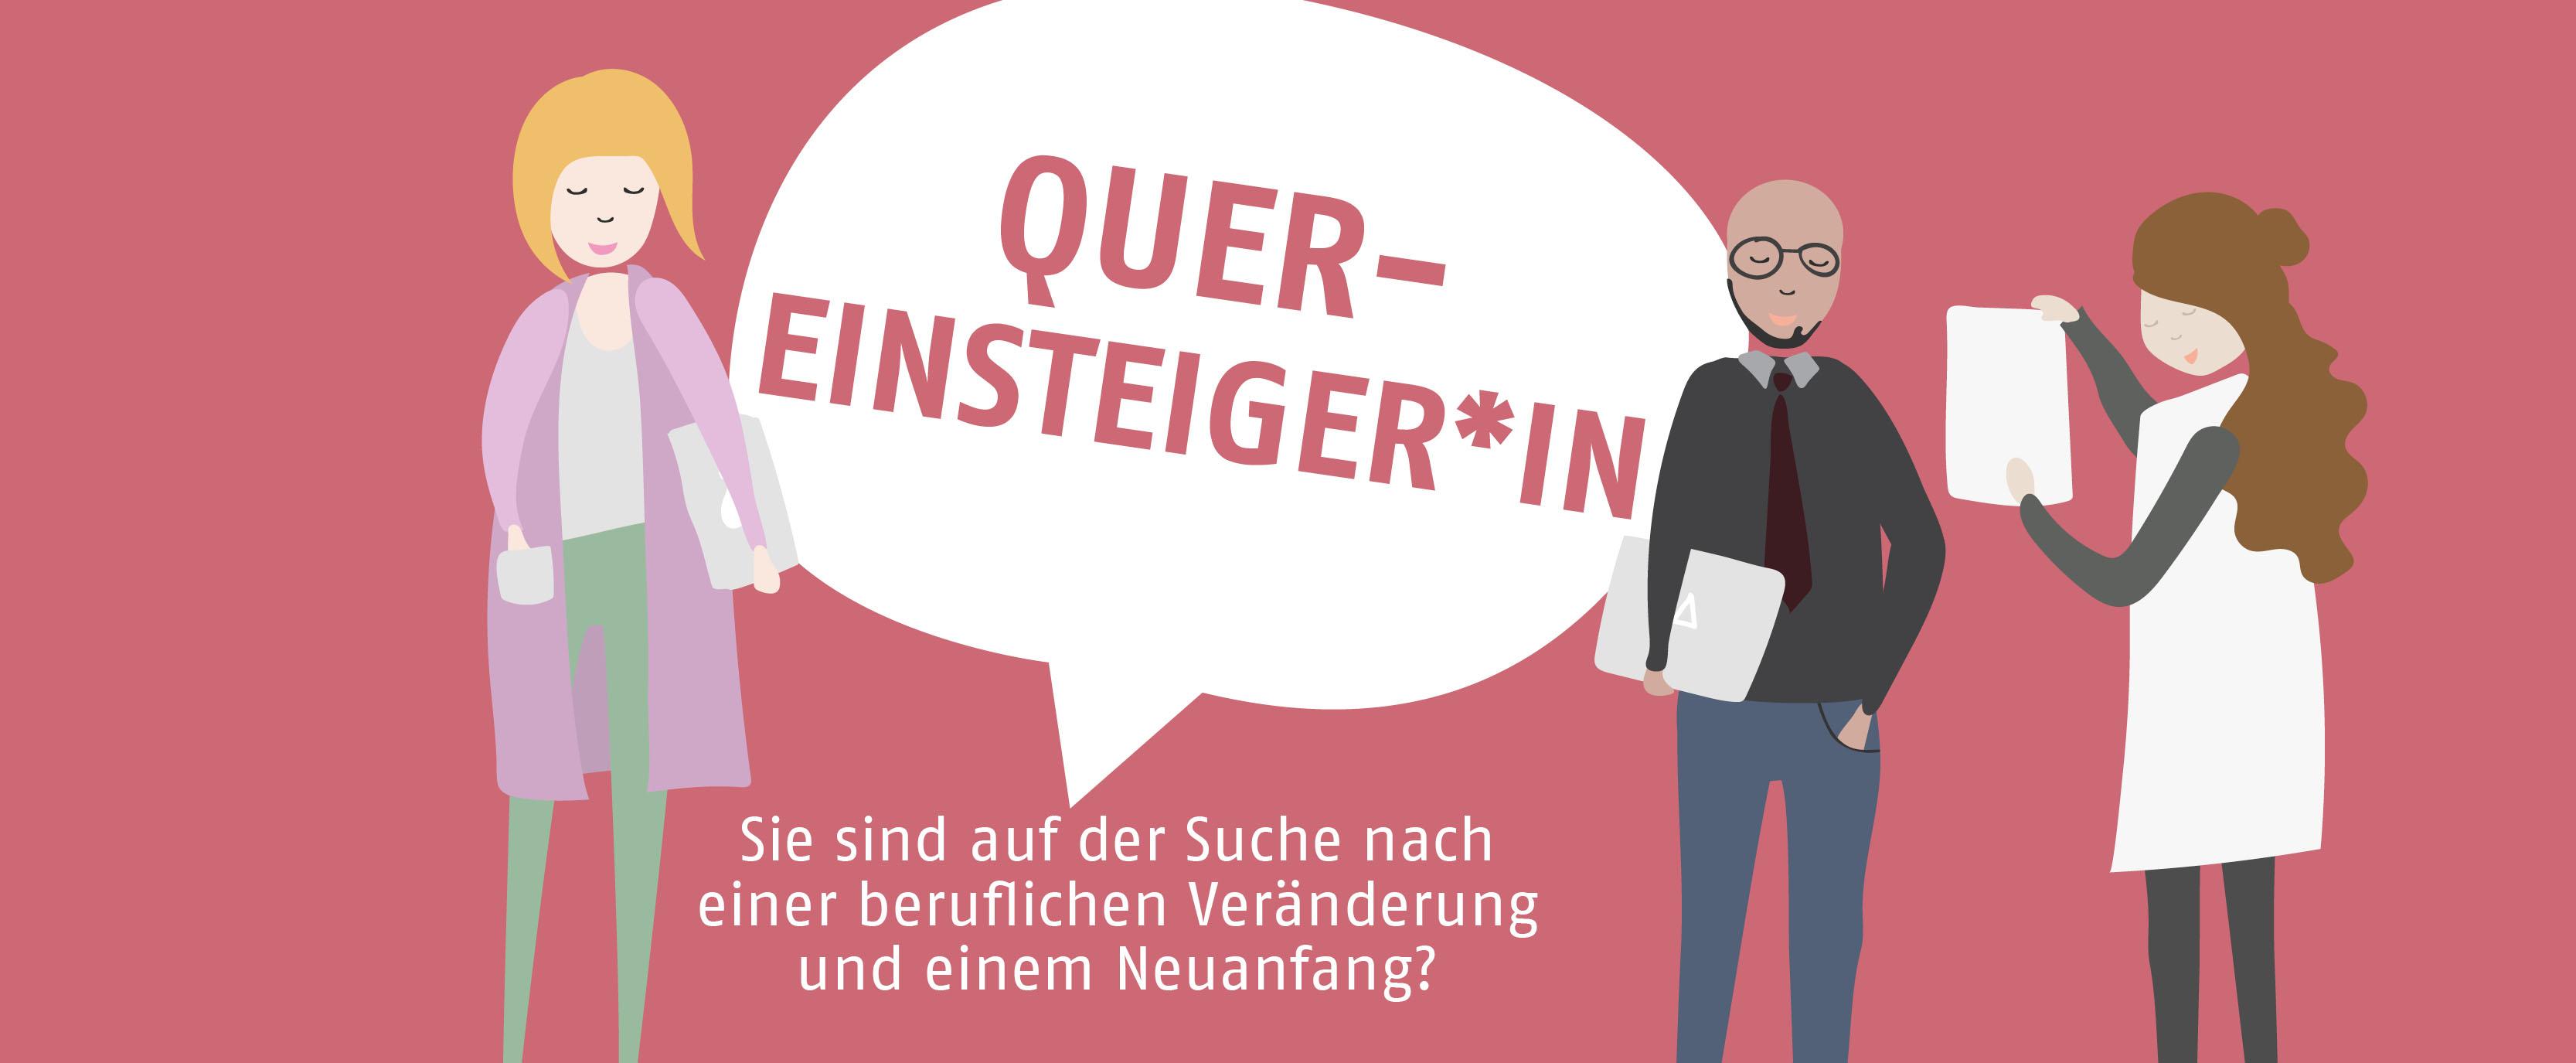 AWO Bezirksverband Ober- und Mittelfranken e. V. - Quereinsteiger*innen